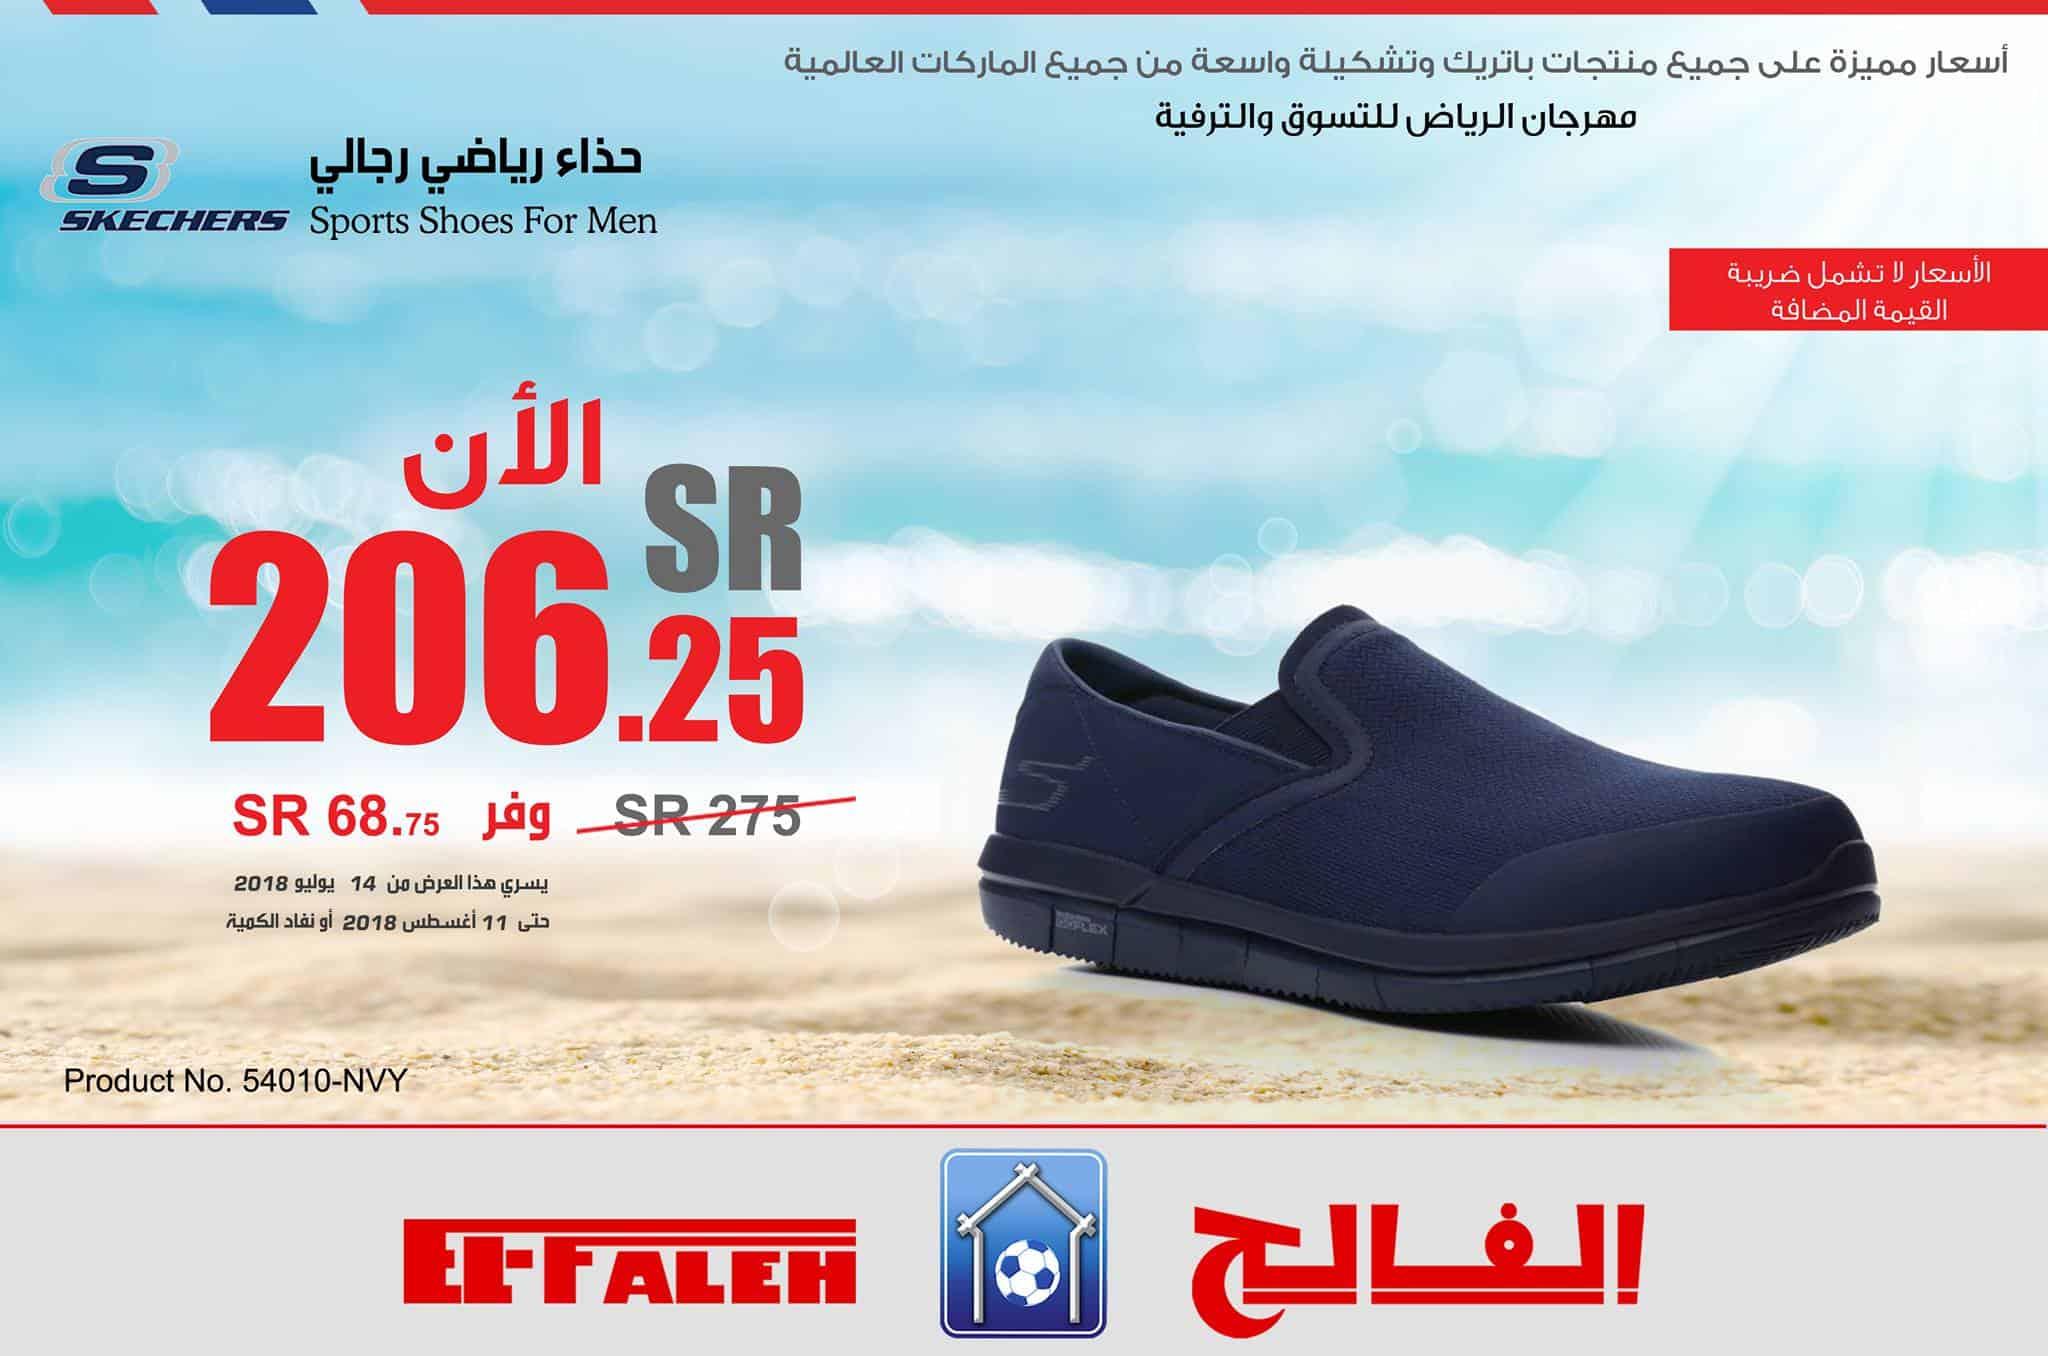 a57e6d6da ... عروض الفالح لشهر رمضان حذاء رياضى رجالي -السعر:348 ر.س وفر 116 ريال ...